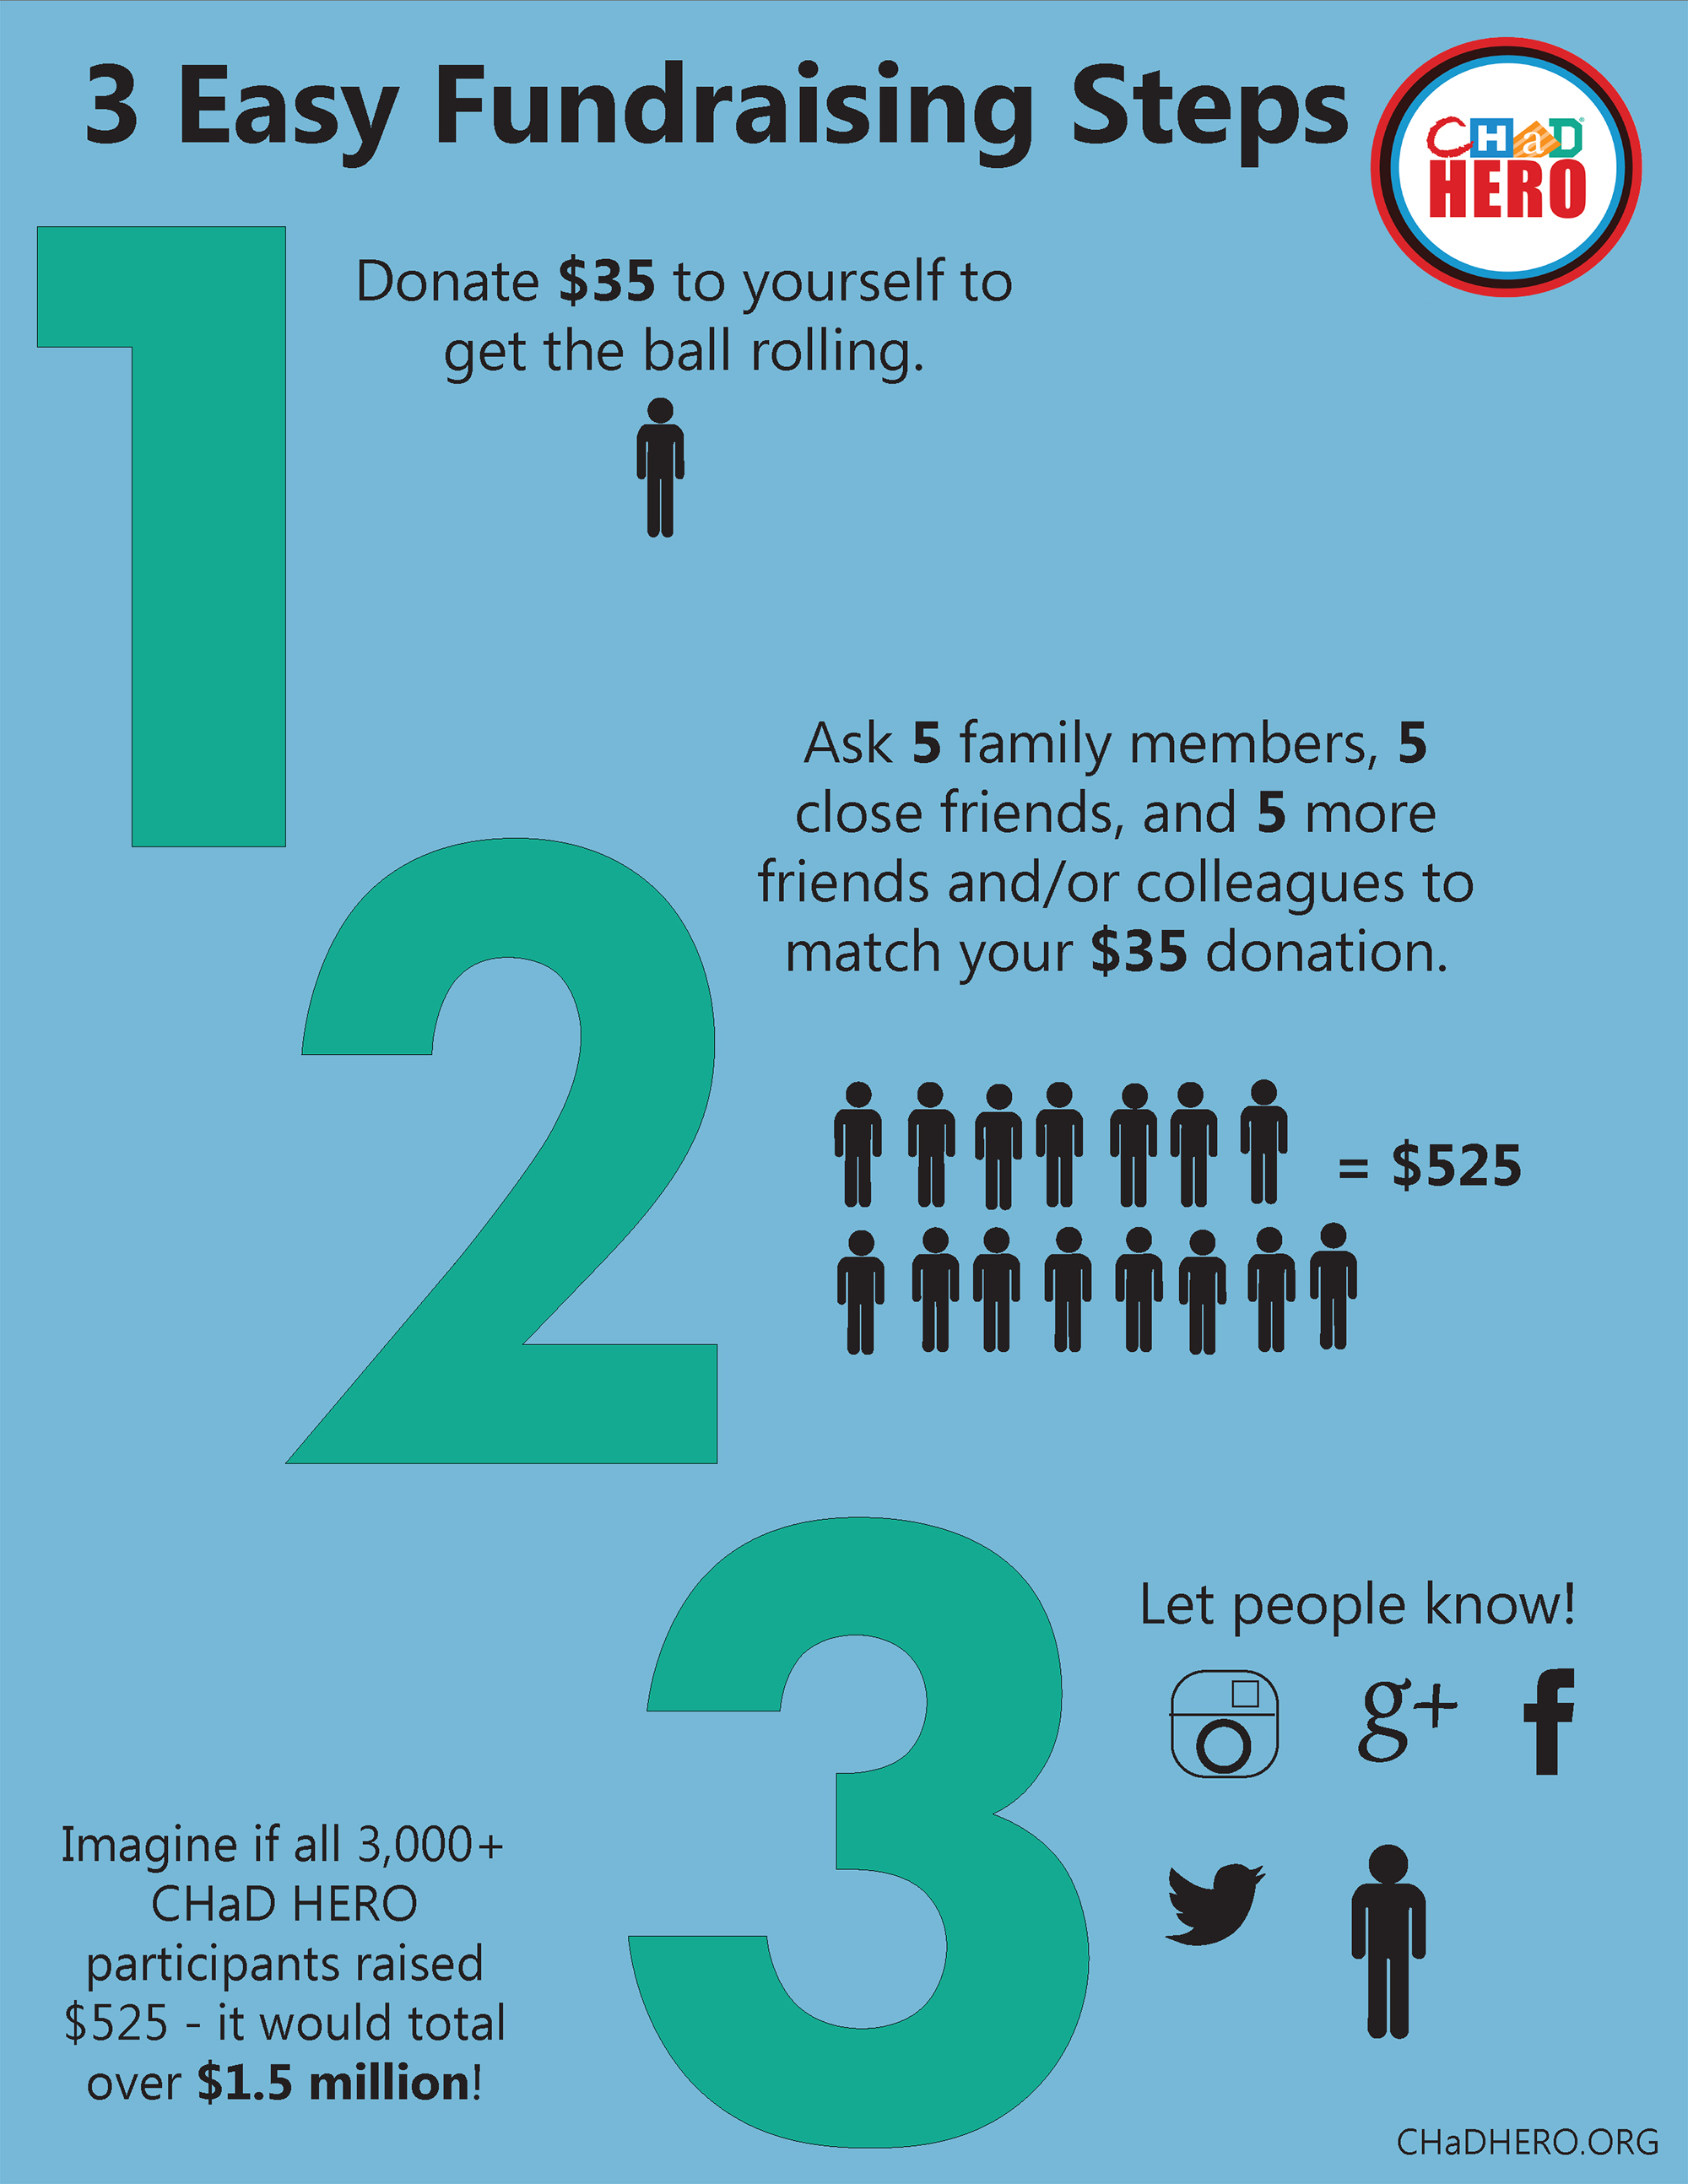 3 Easy Fundraising Steps